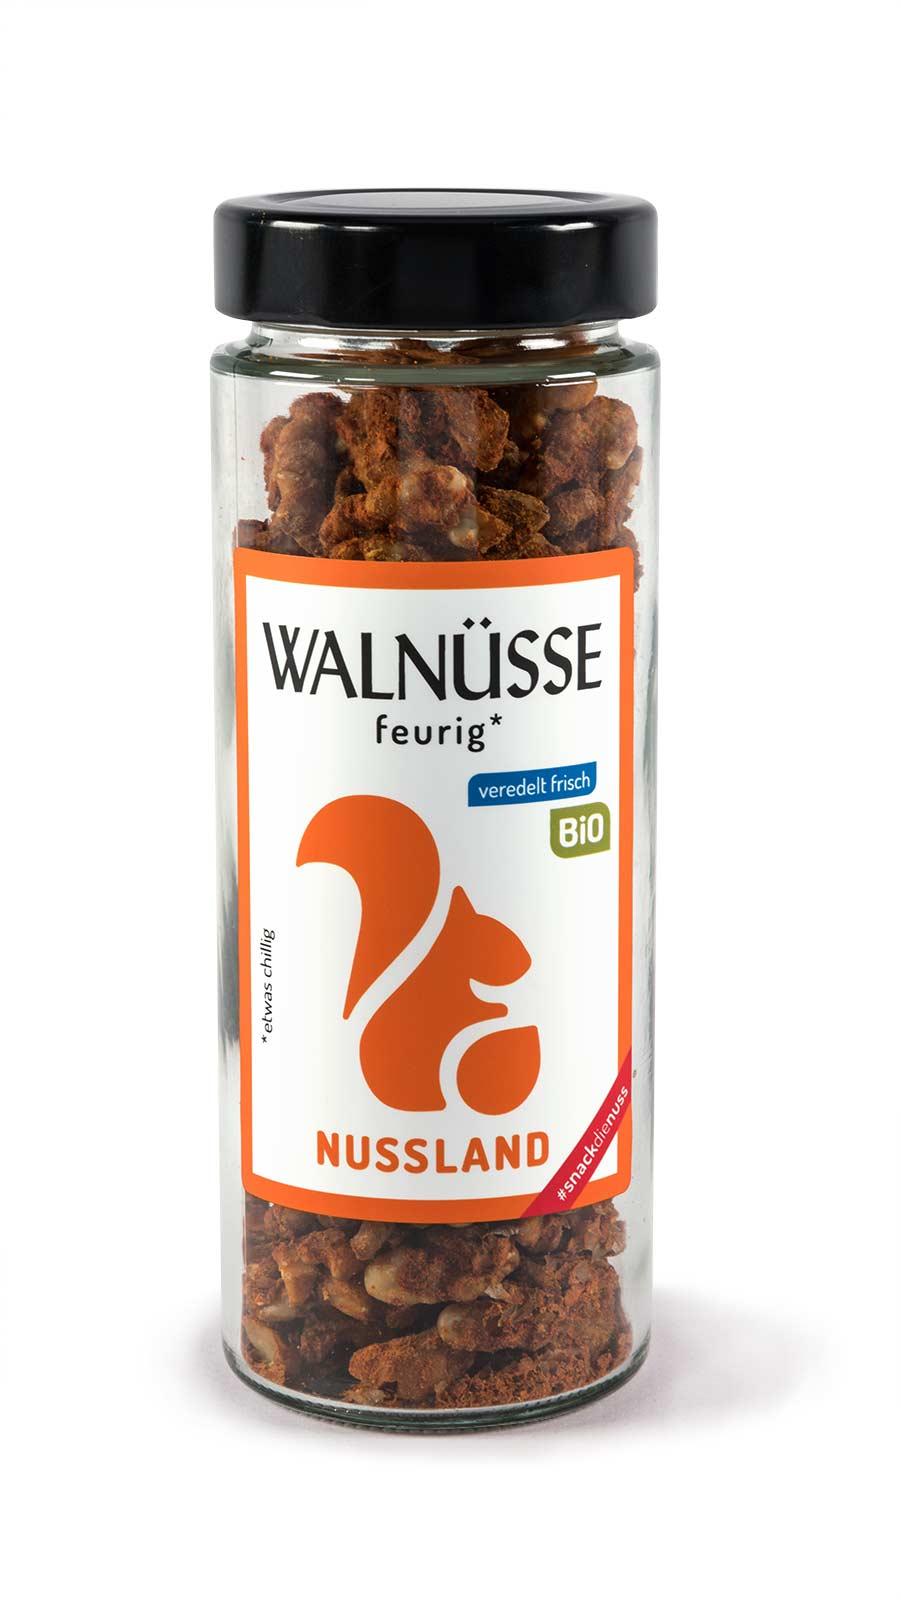 BIO Walnuss-Snack 'Feurig'